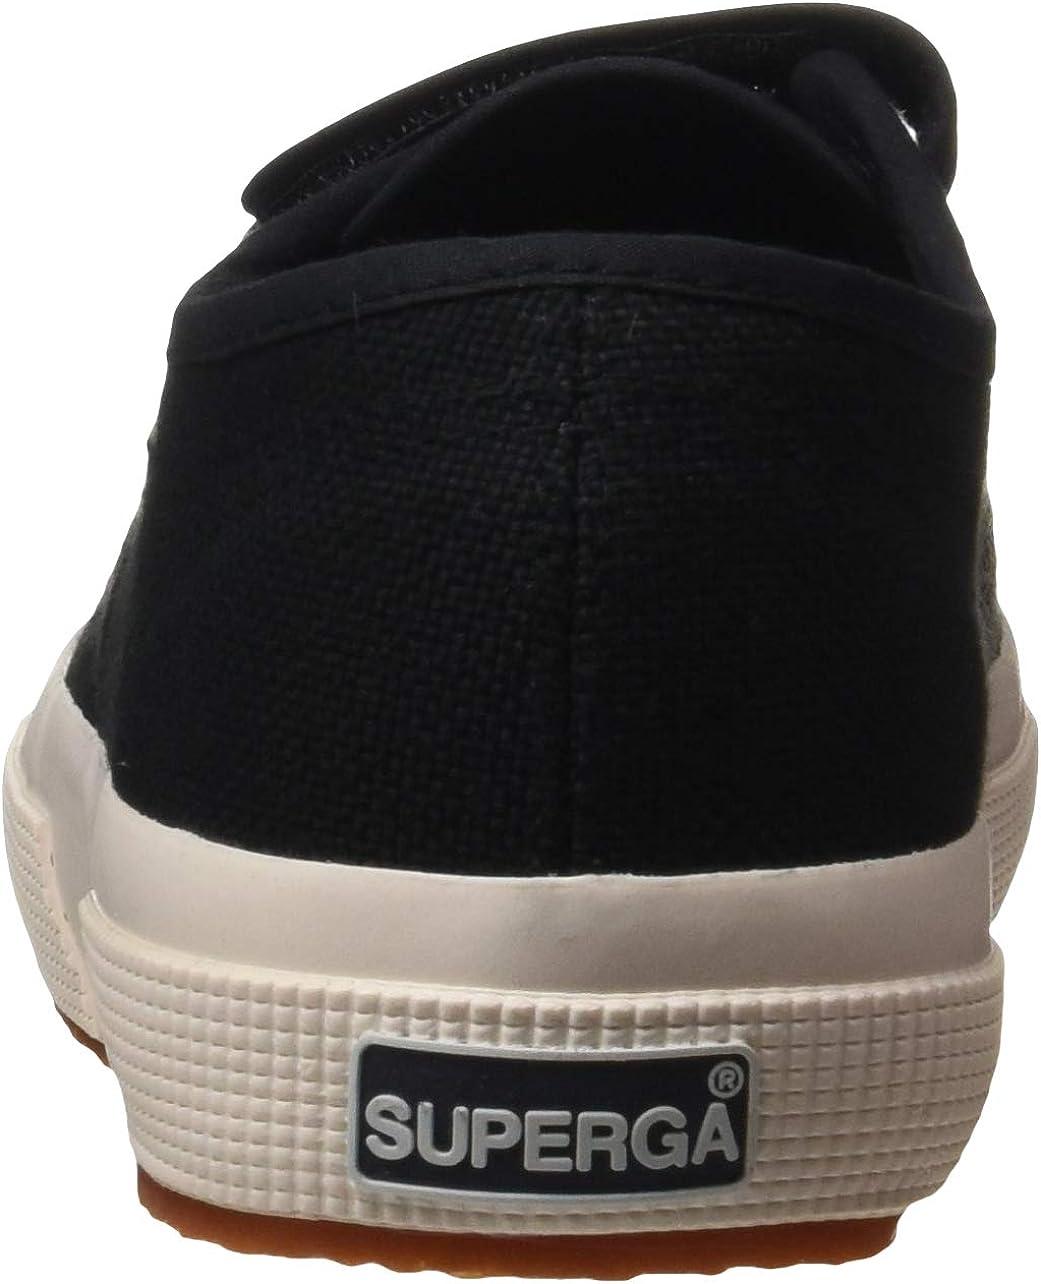 Superga Unisex Adults 2750-cot3strapu Gymnastics Shoes